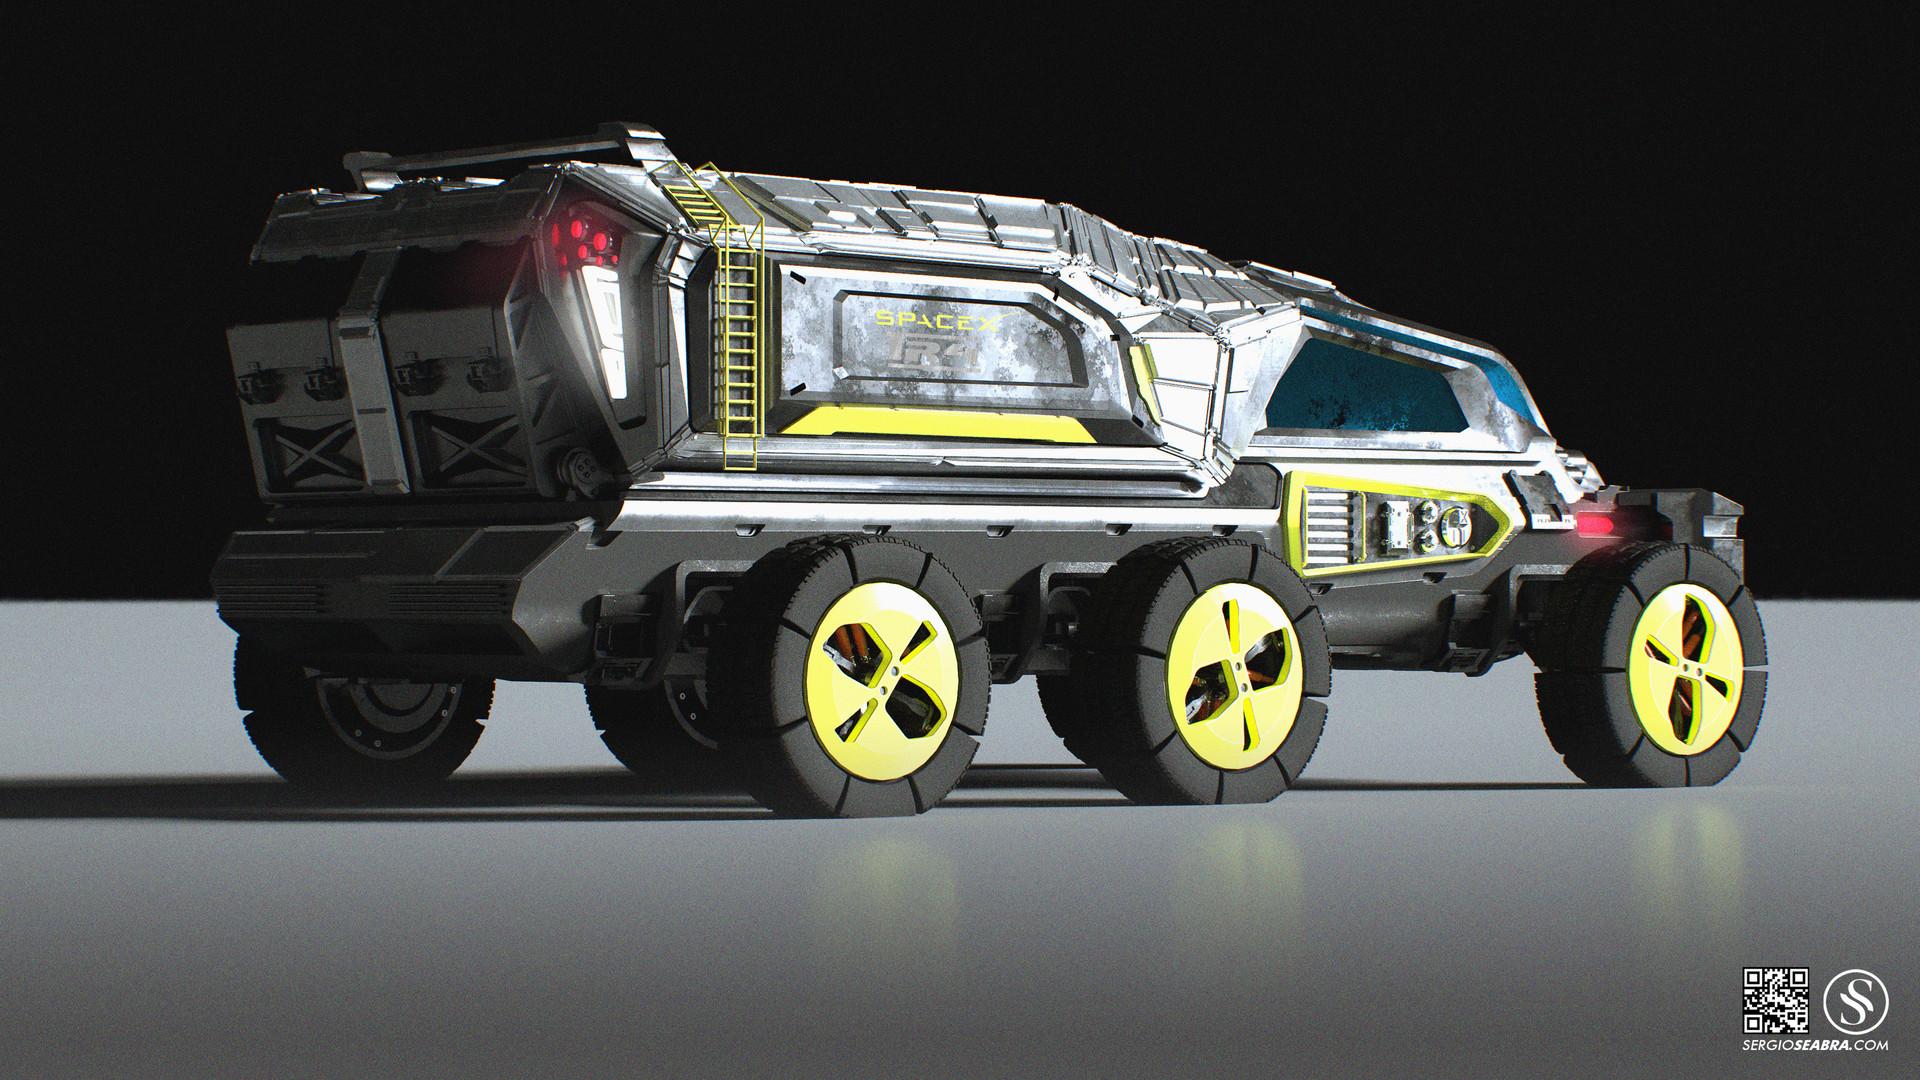 Sergio seabra 201810 veh mars rover layout4 ss